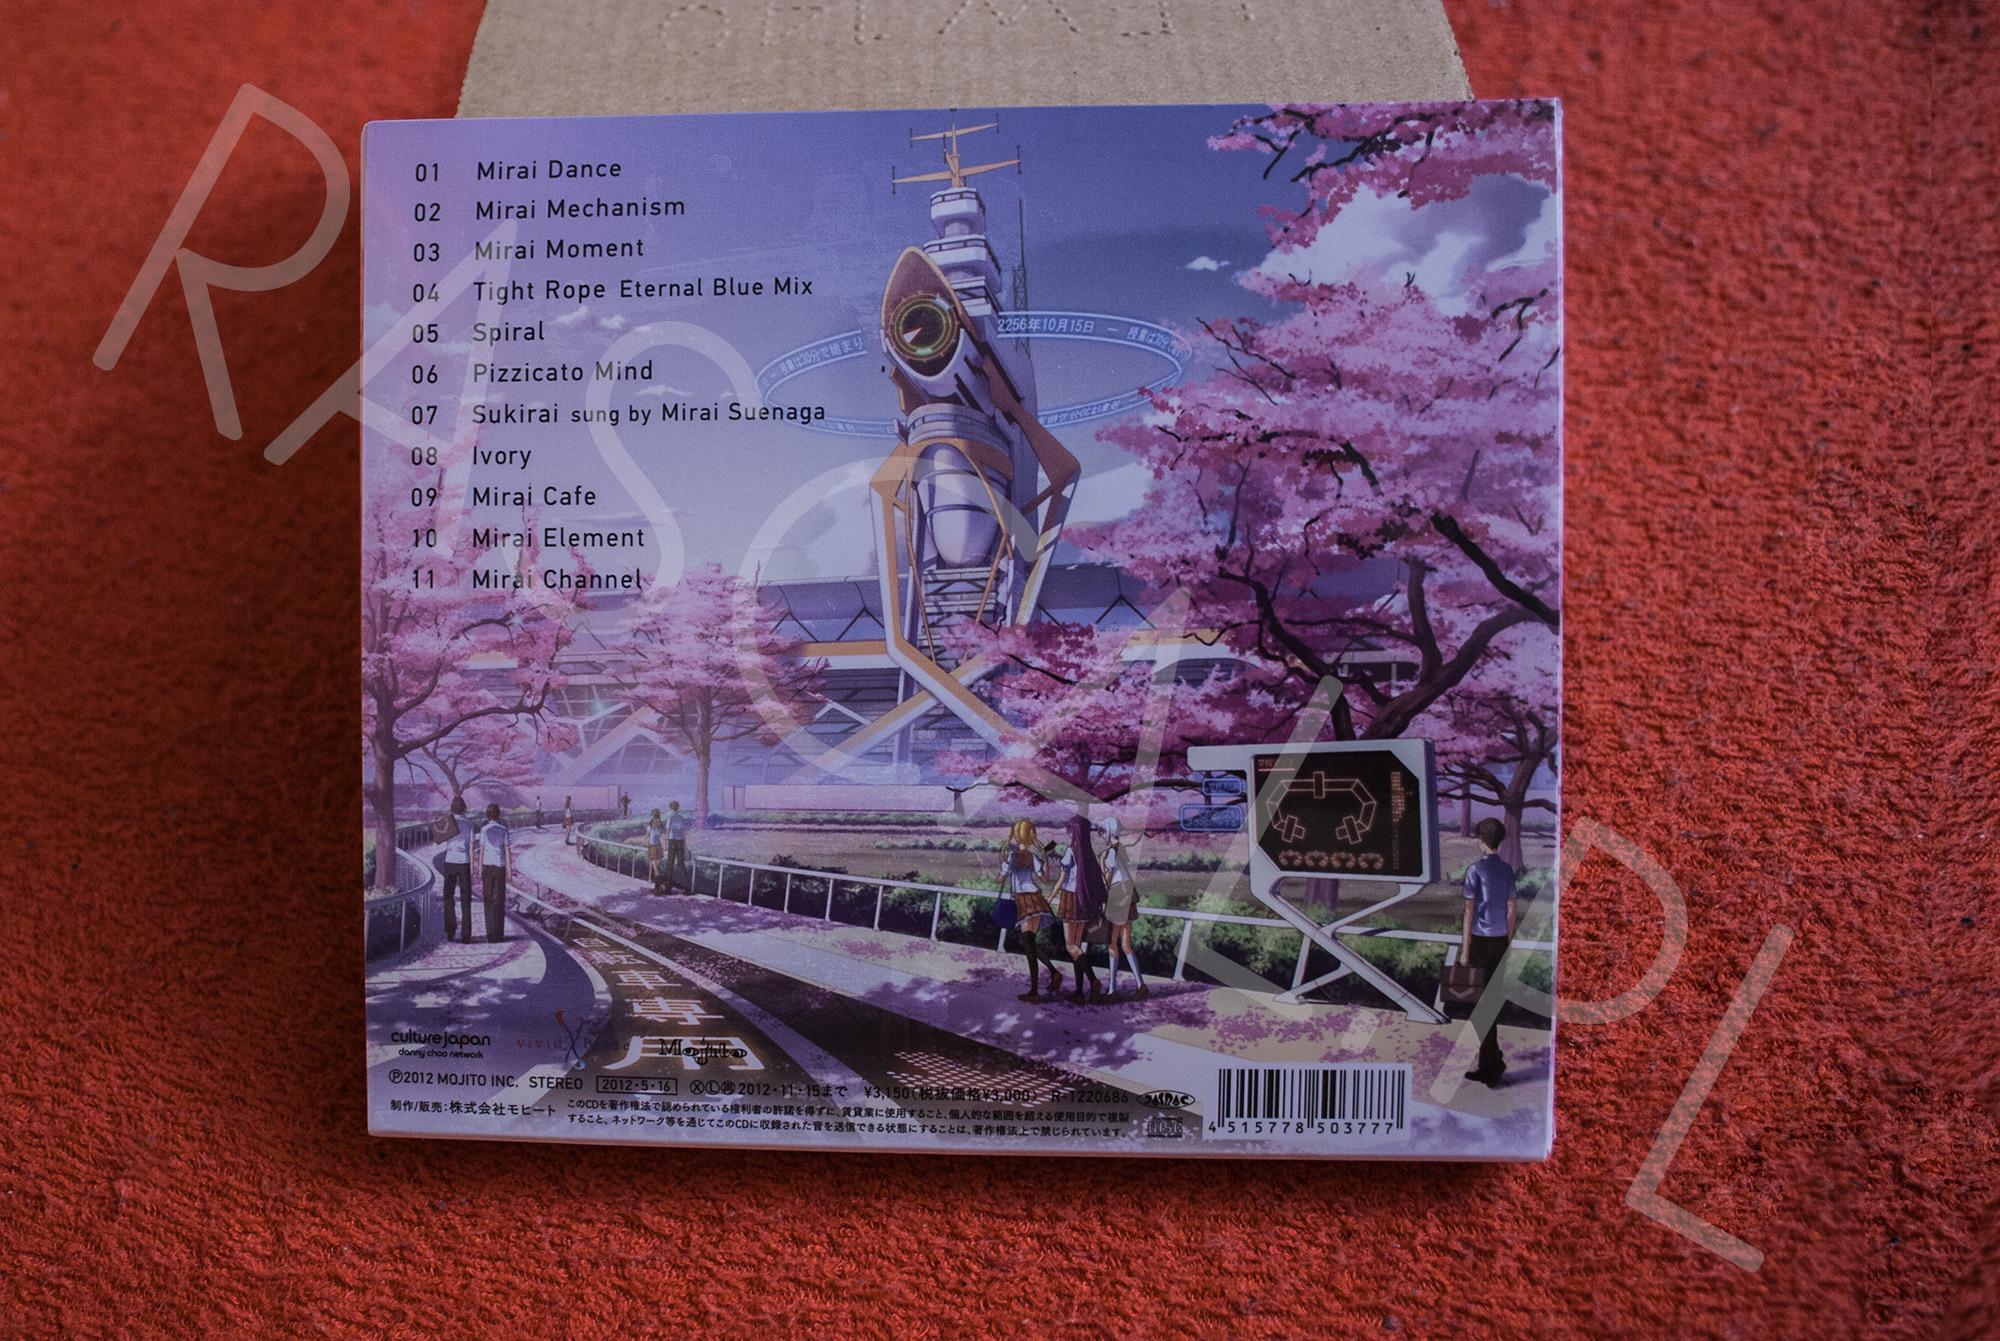 vividblaze-mirai-music-002-recenzja-rascal-pl-jpg